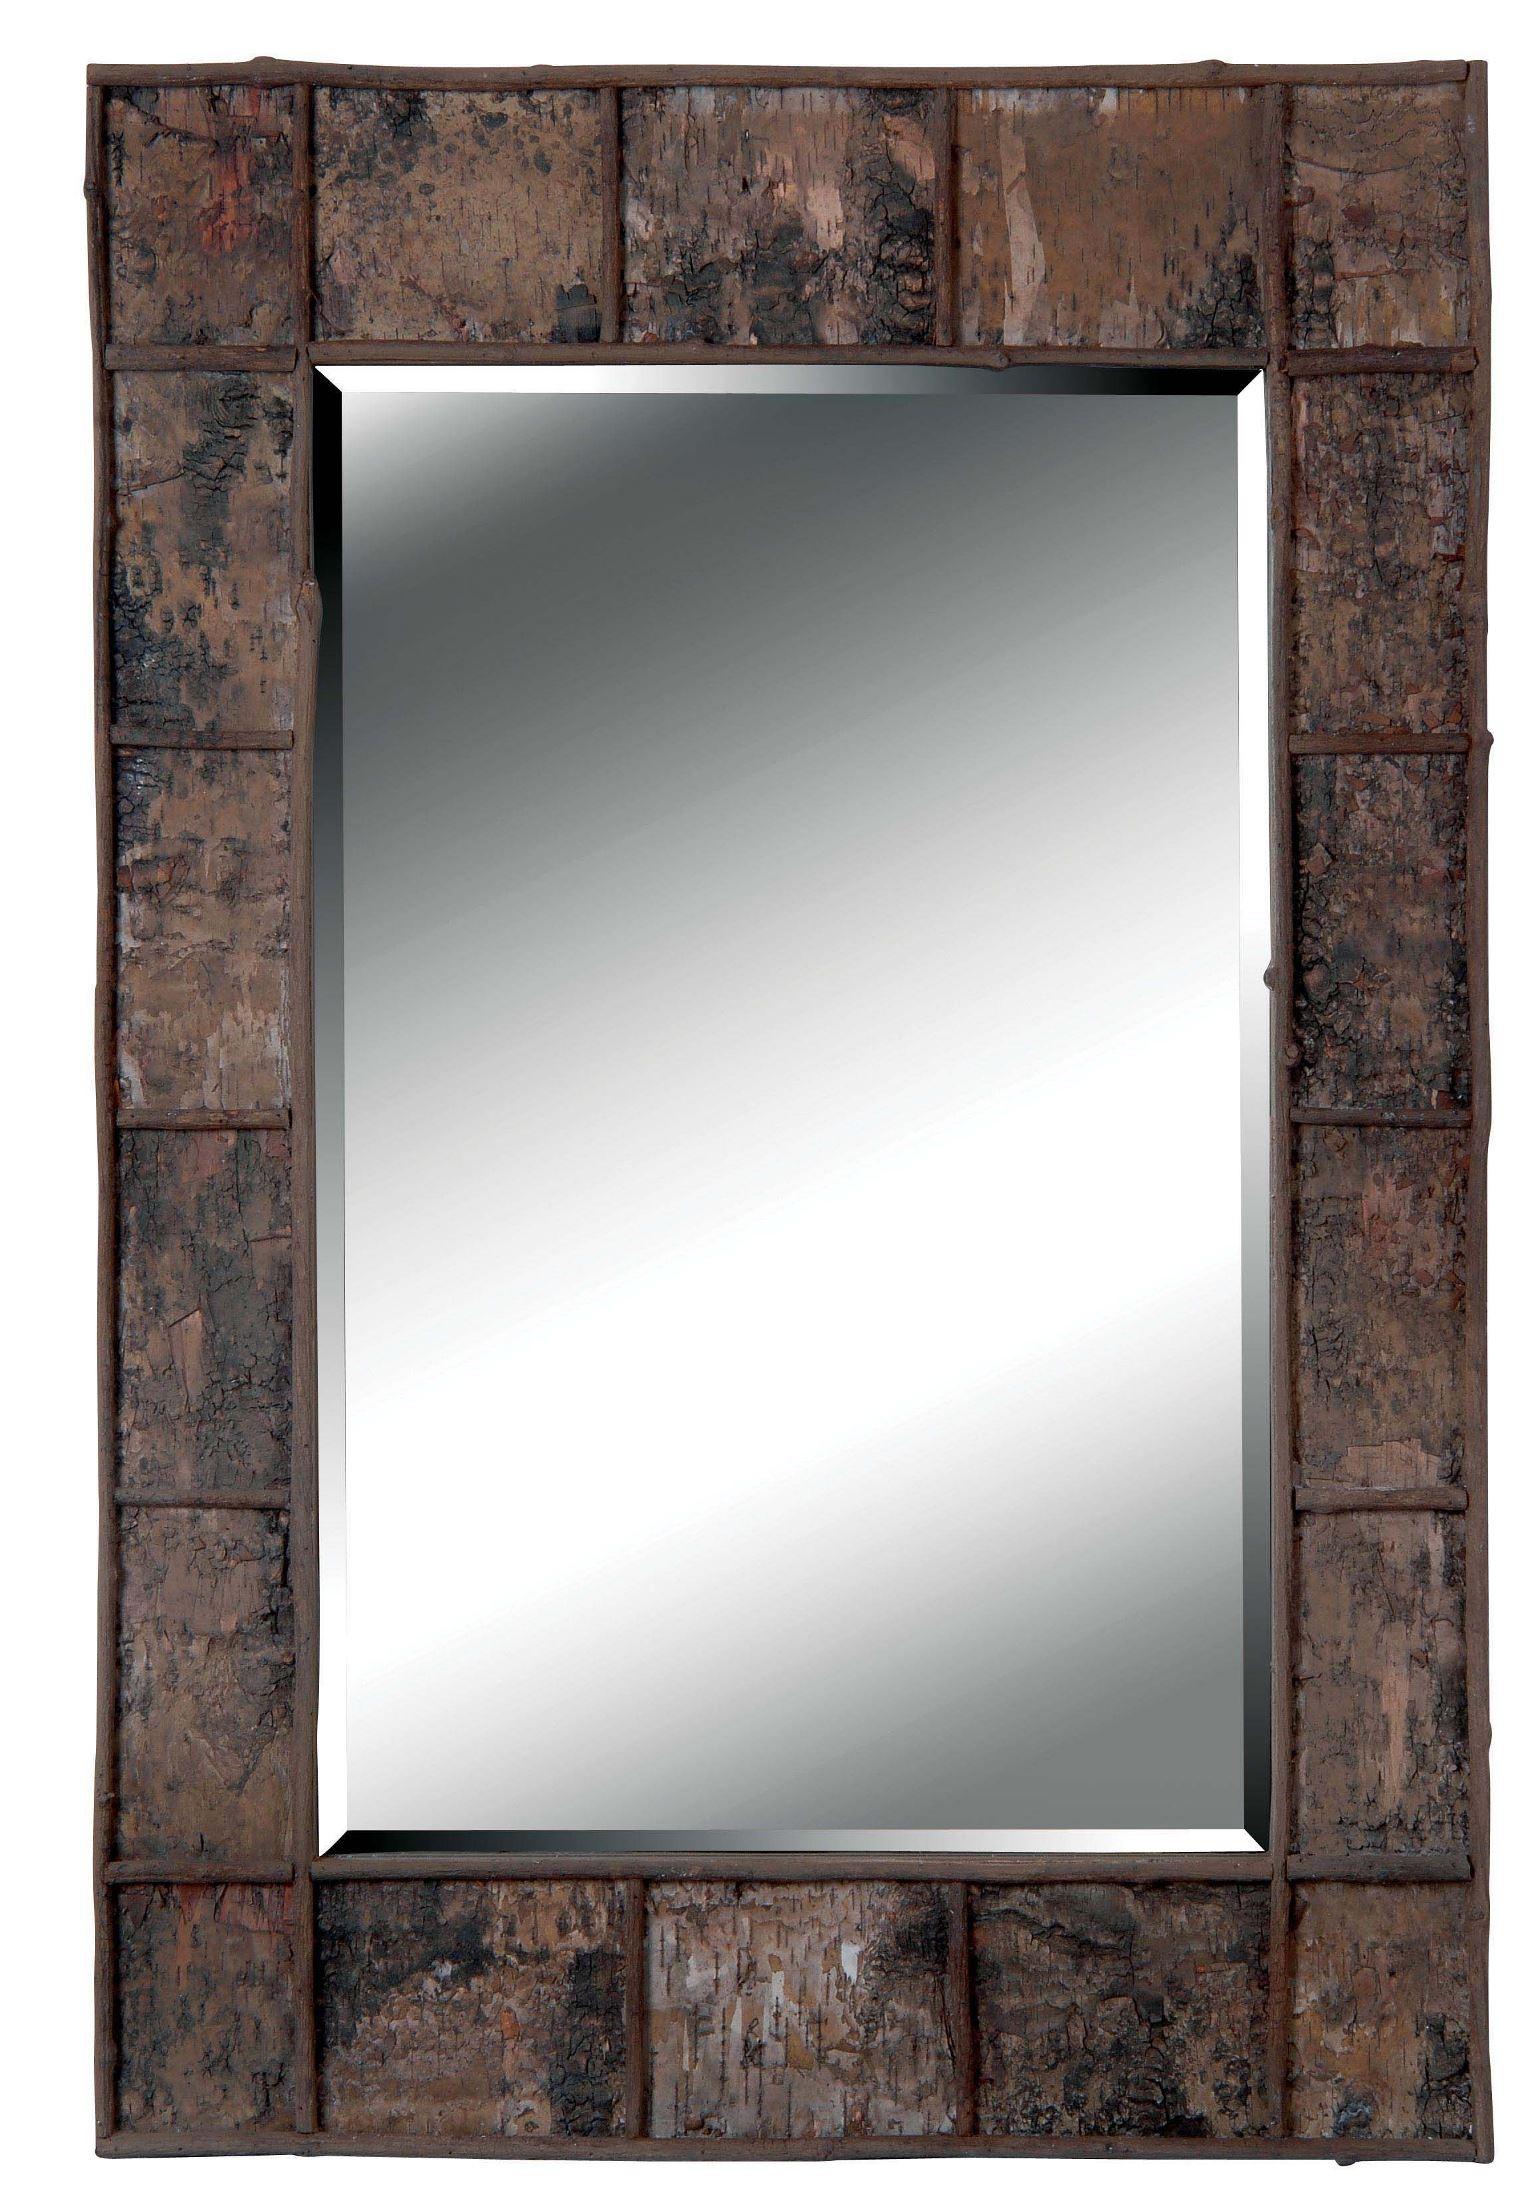 Birch Bark Wall Mirror From Kenroy 61002 Coleman Furniture